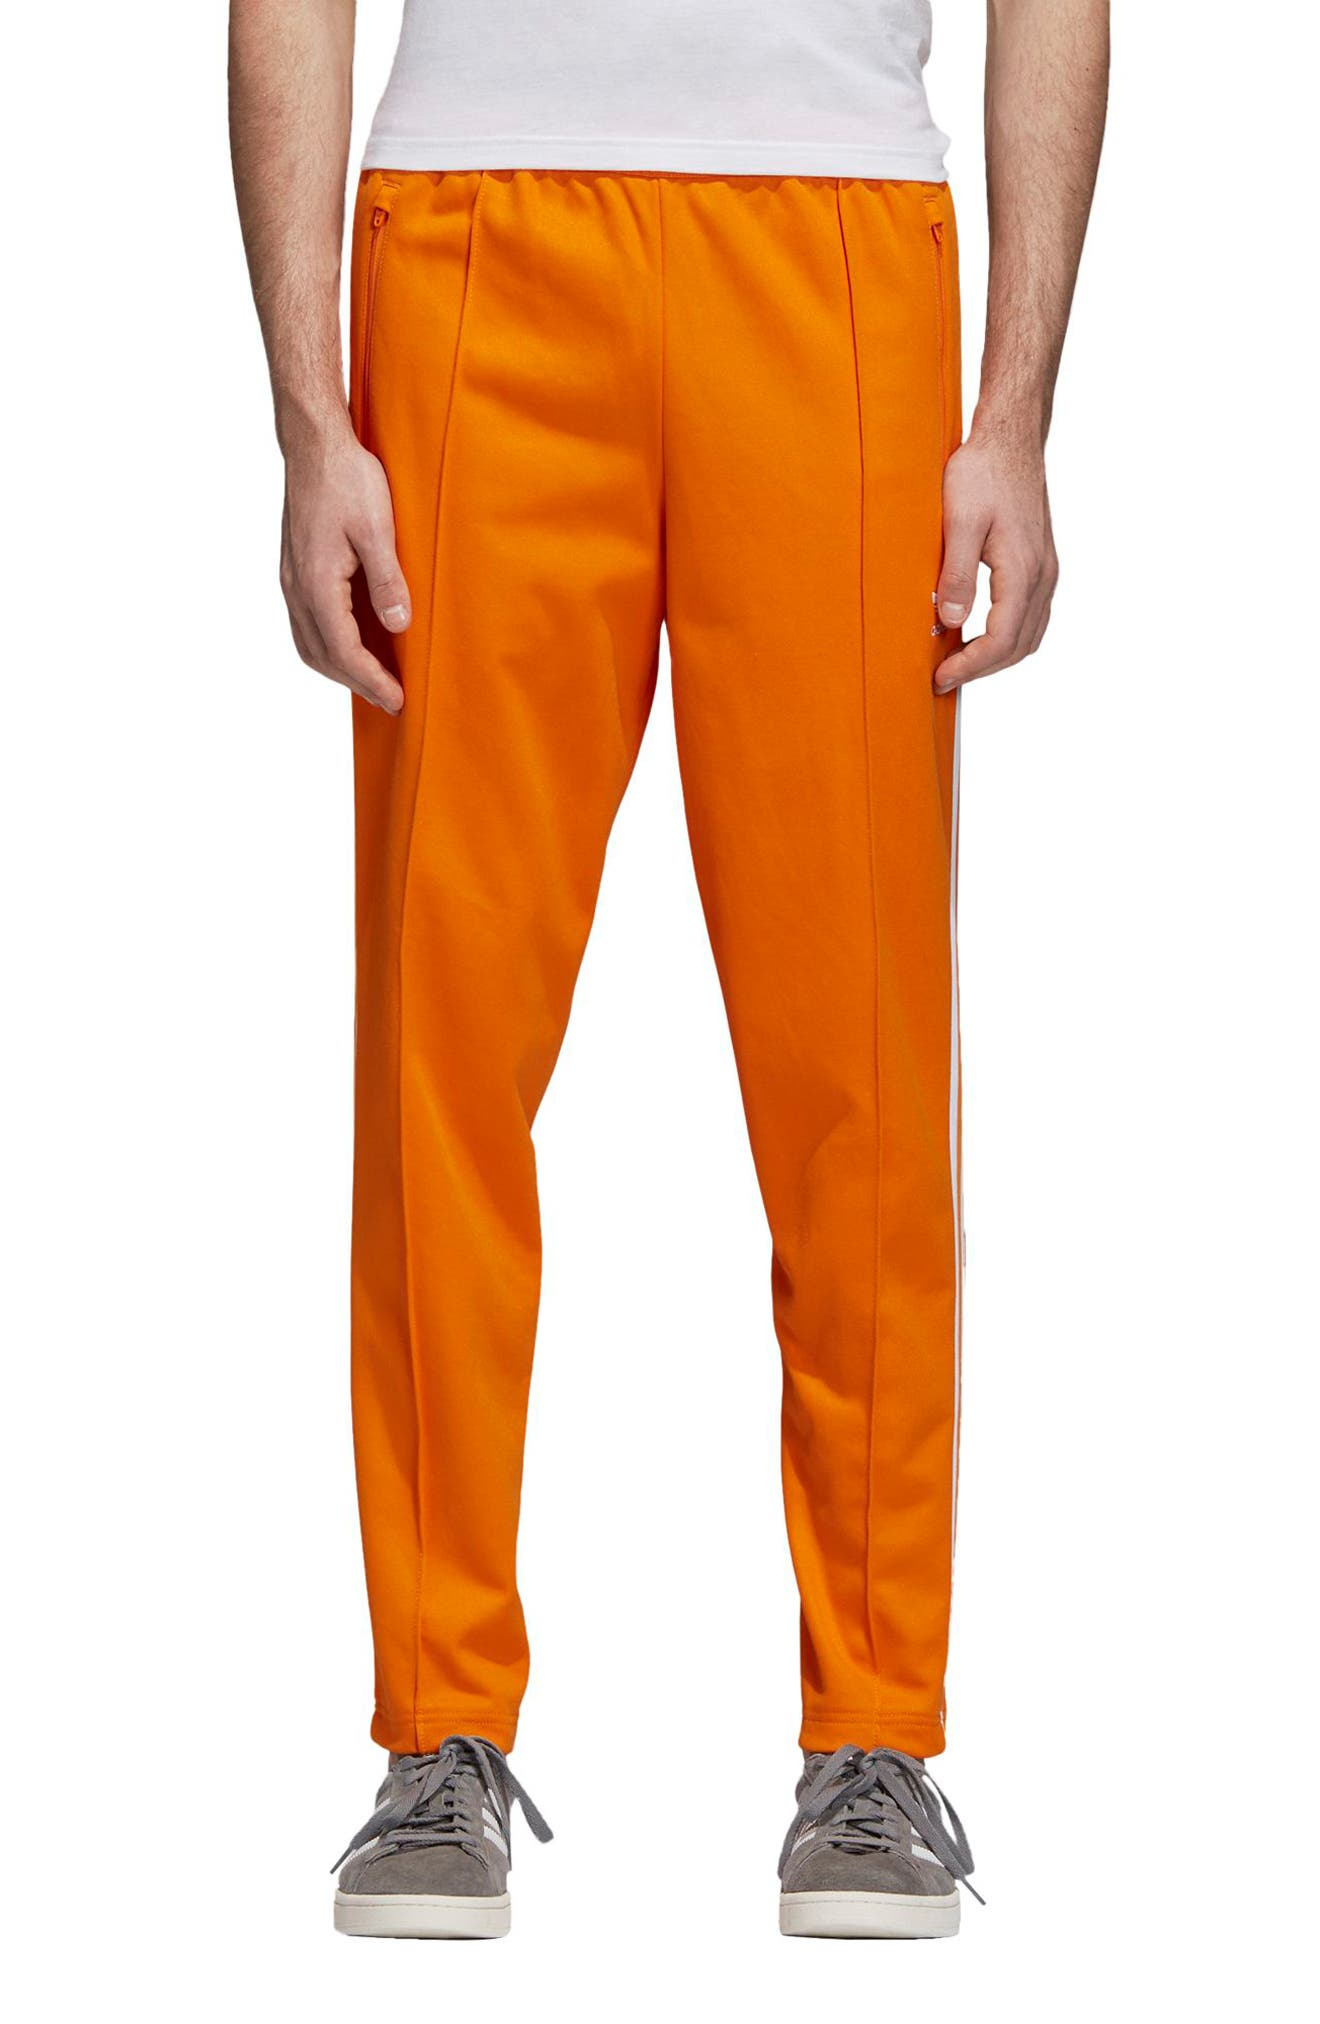 BB Track Pants,                             Main thumbnail 1, color,                             Bright Orange